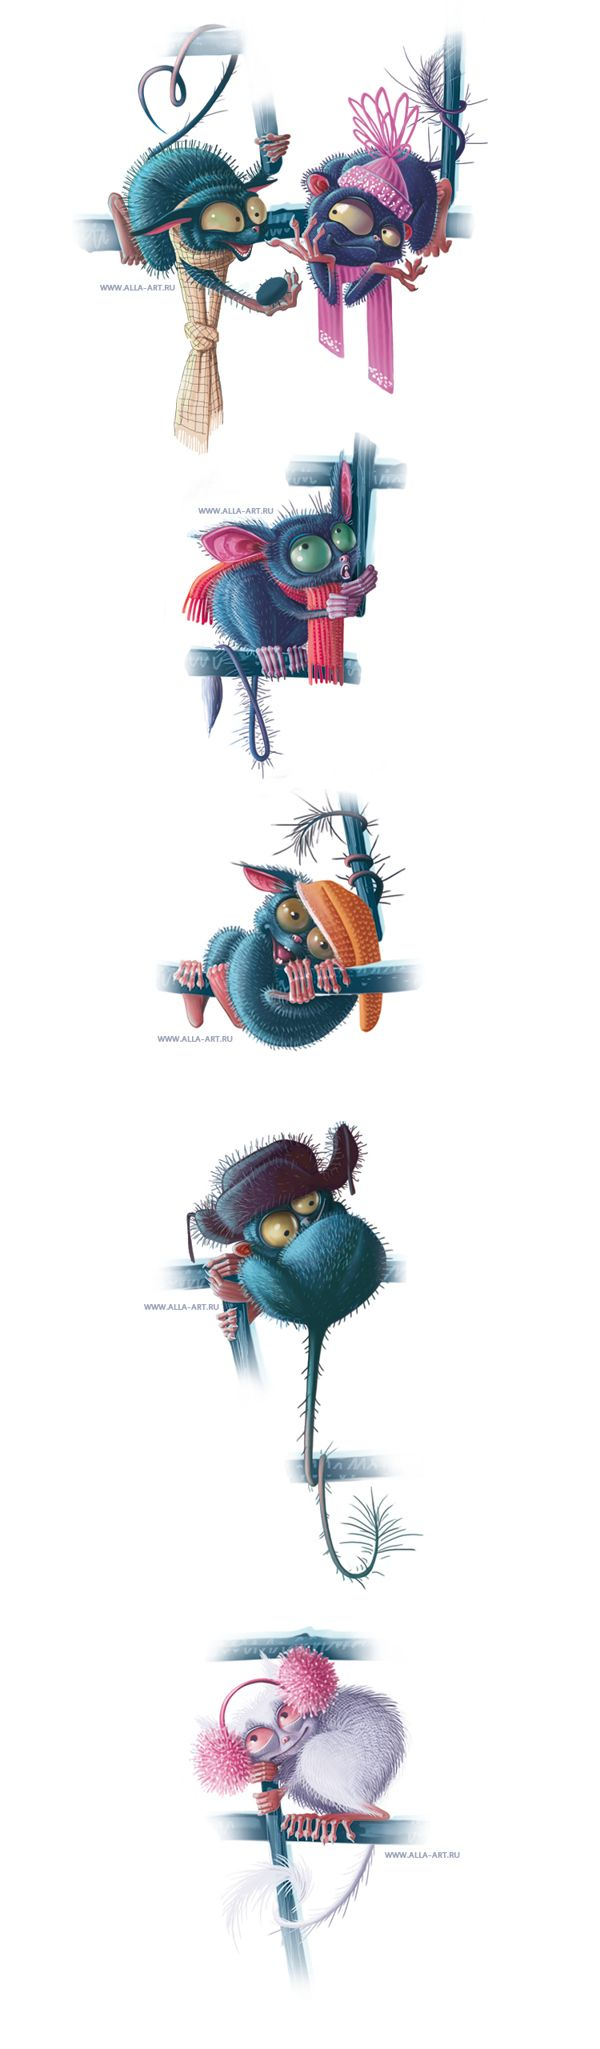 PostCard Illustration #illustration